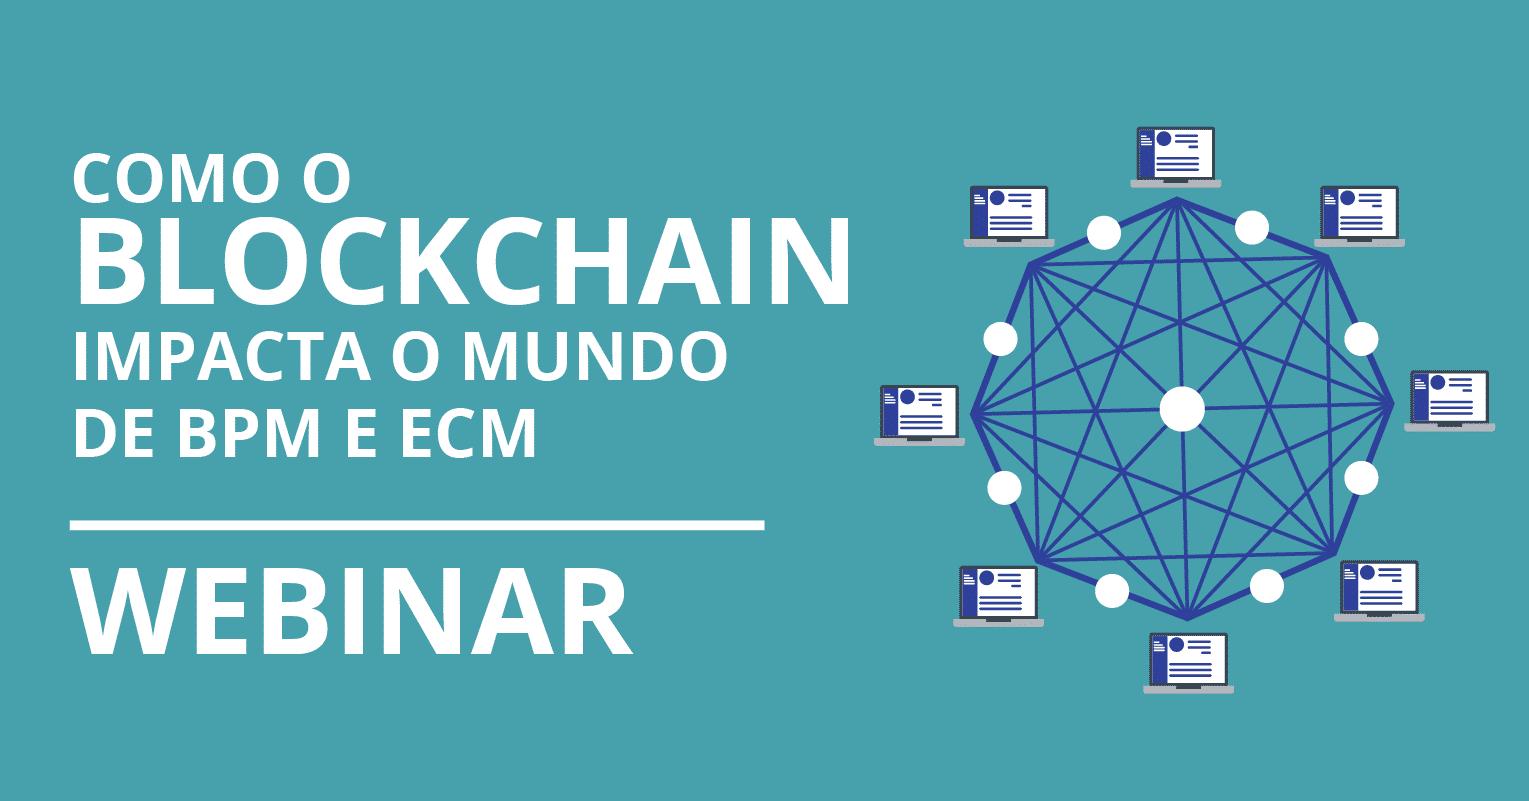 Como blockchain impacta BPM e ECM